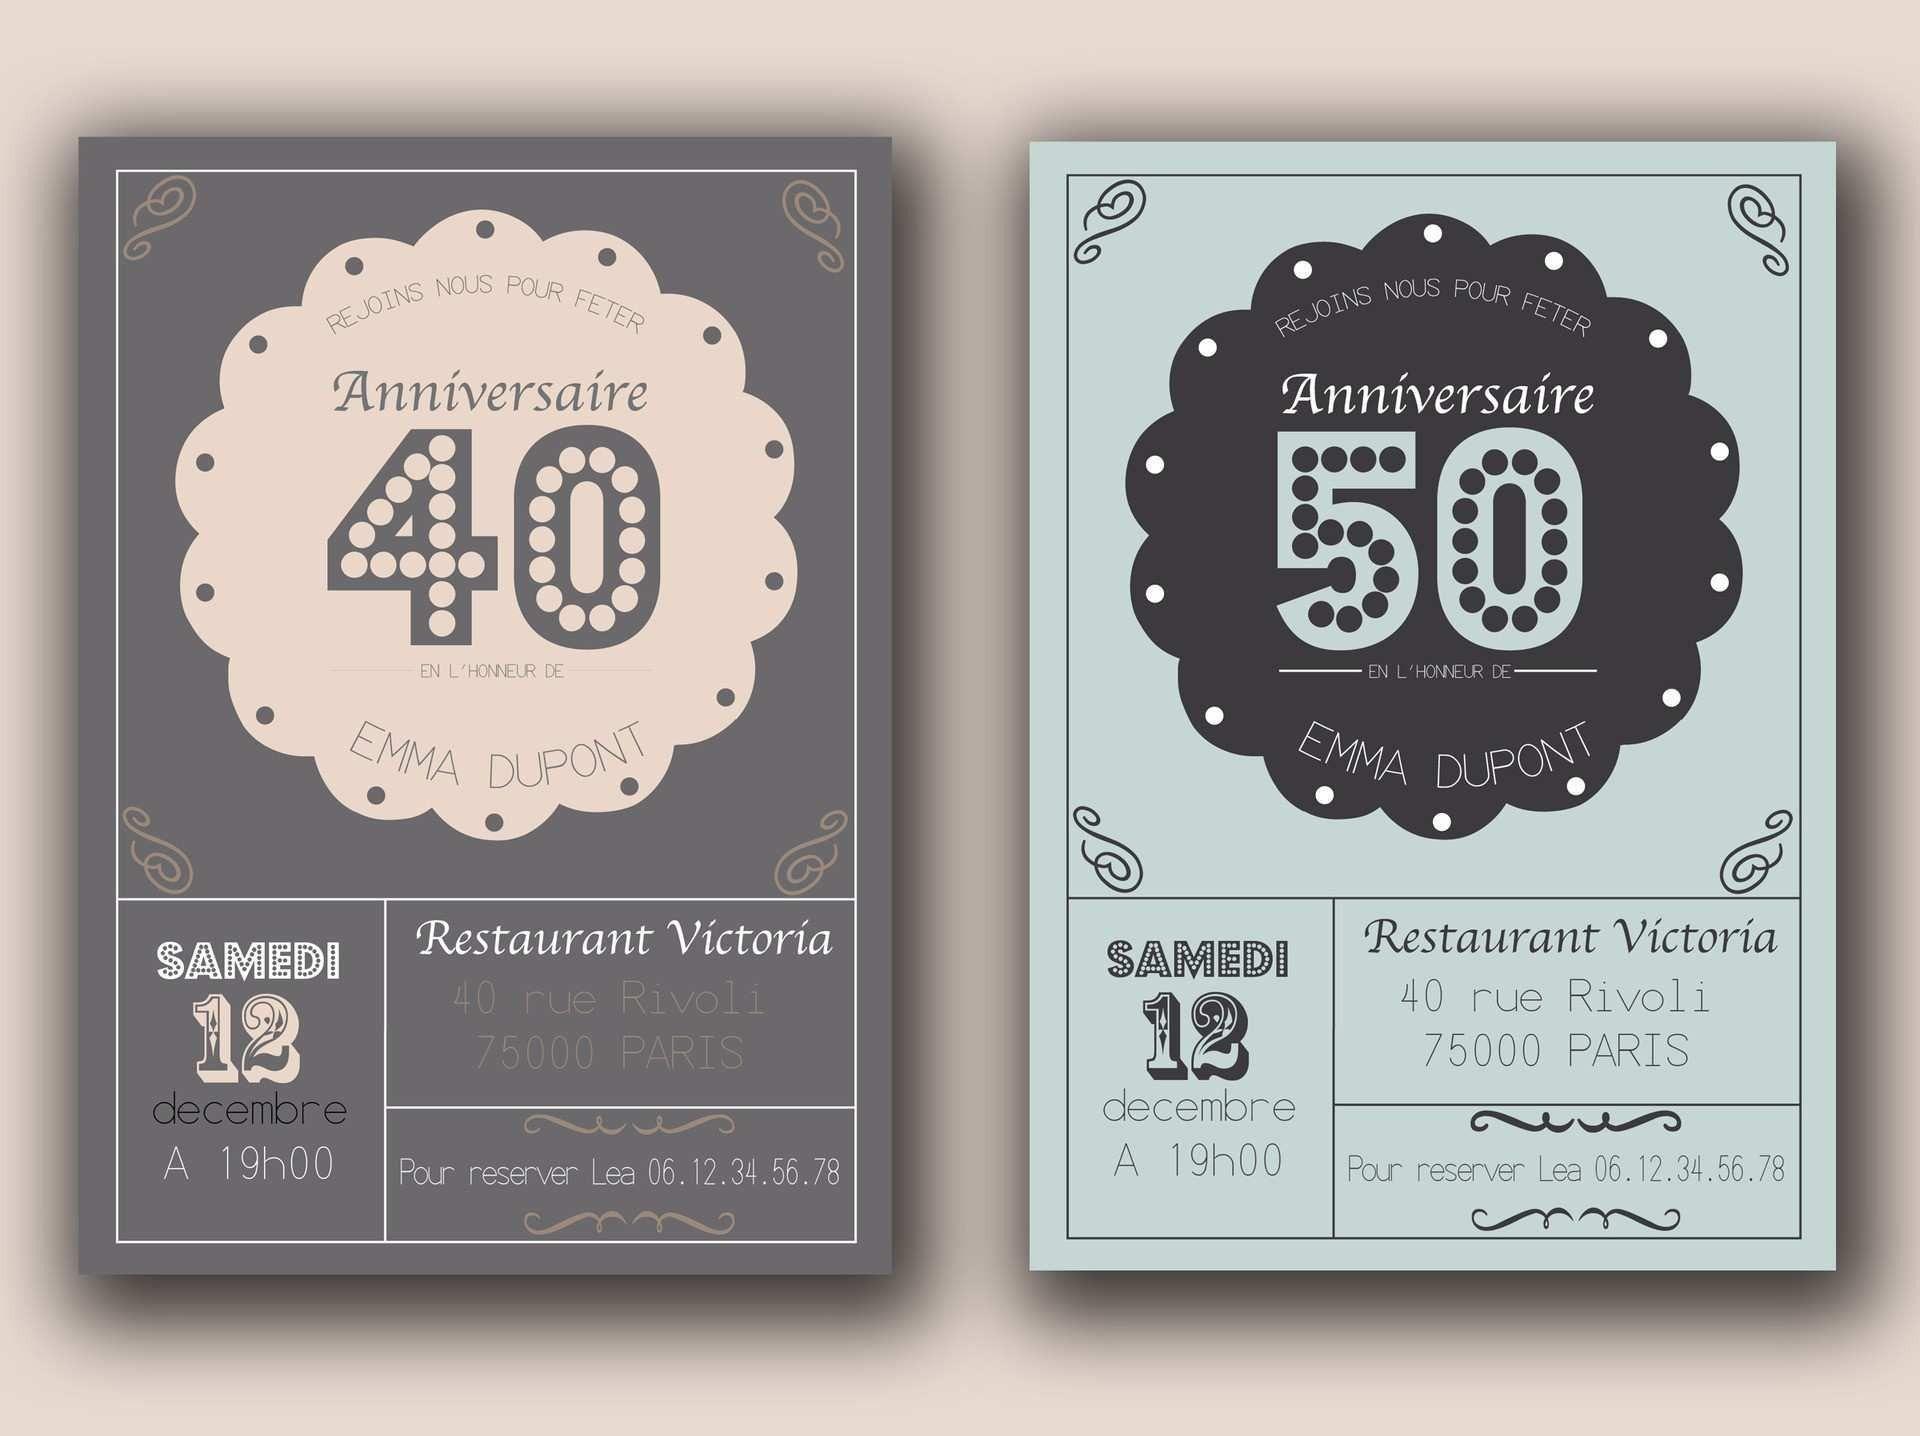 Inspirational Carte Invitation Anniversaire Champetre Birthday Cards To Print Birthday Cards Birthday Invitations